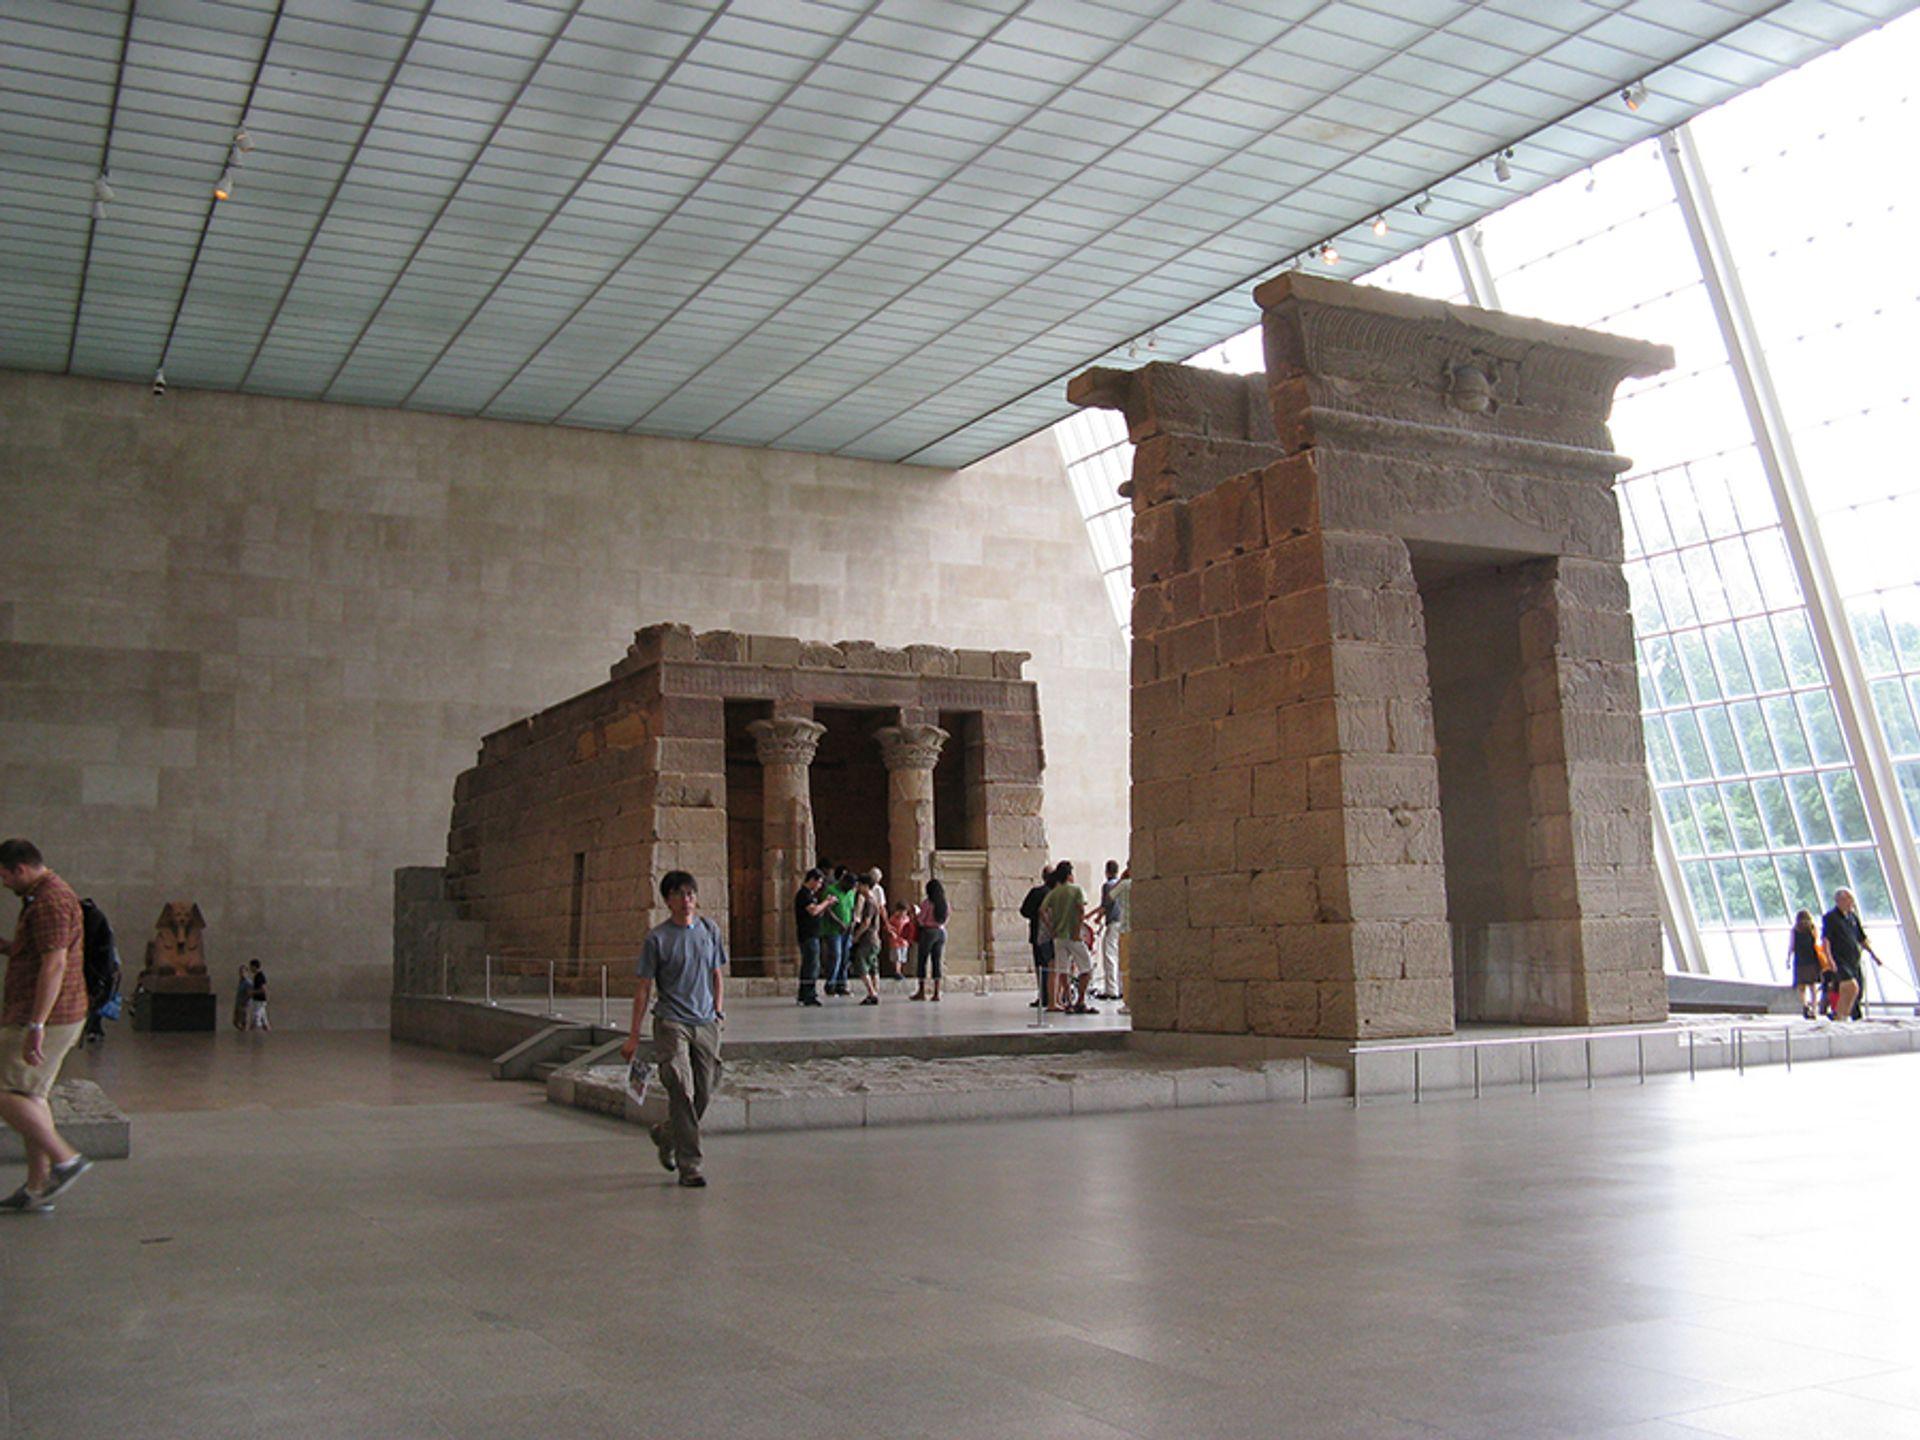 The Met's Sackler Wing houses the Temple of Dendur Yair Haklai